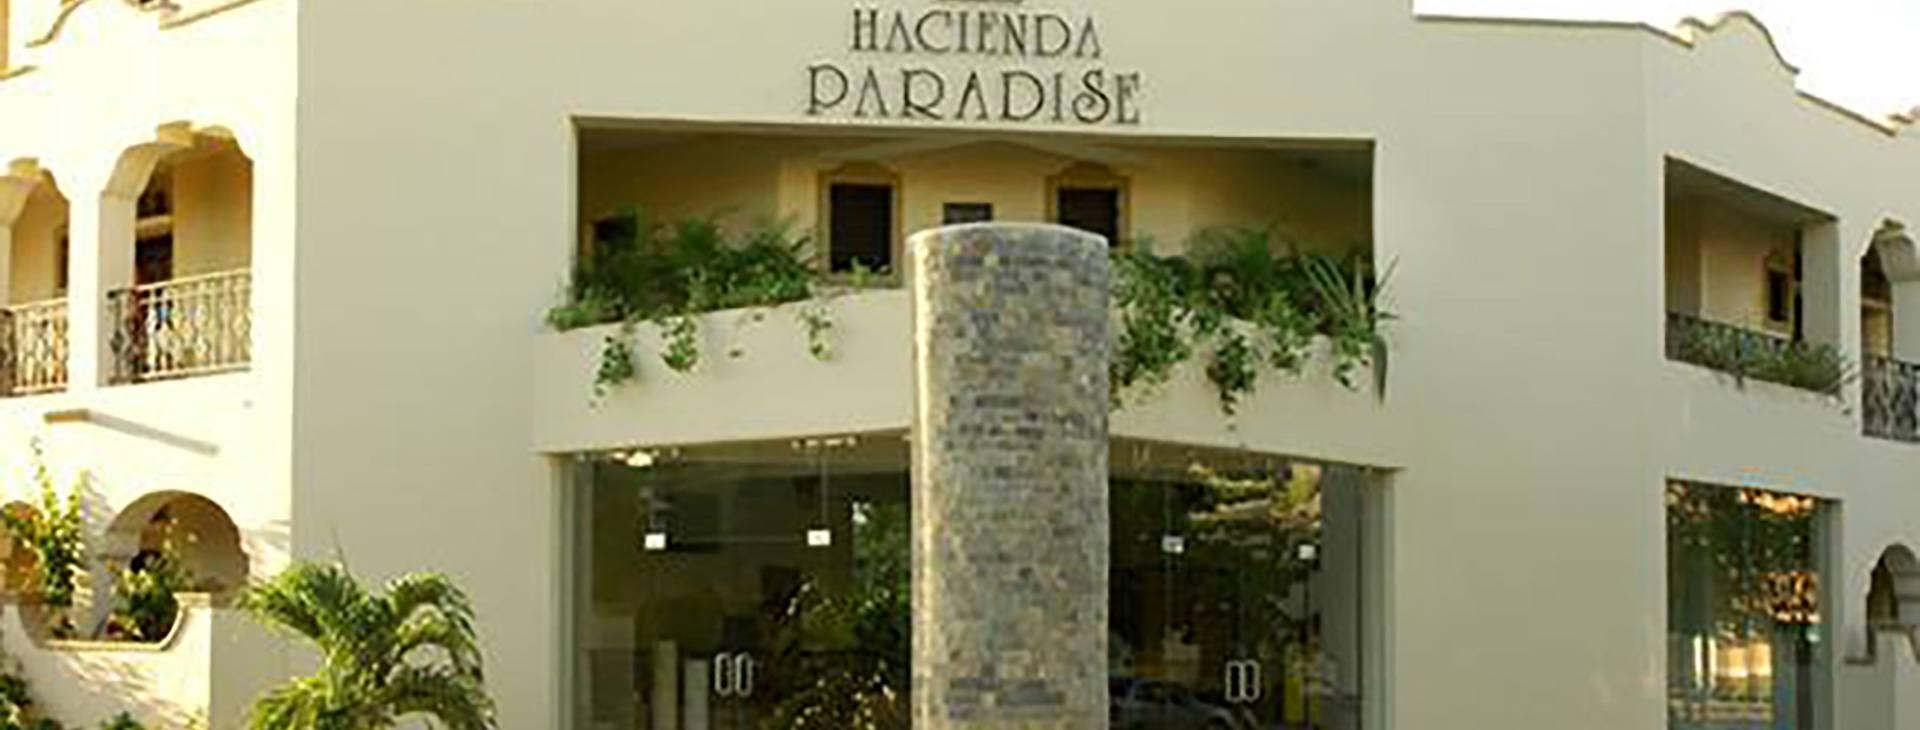 Hacienda Paradise